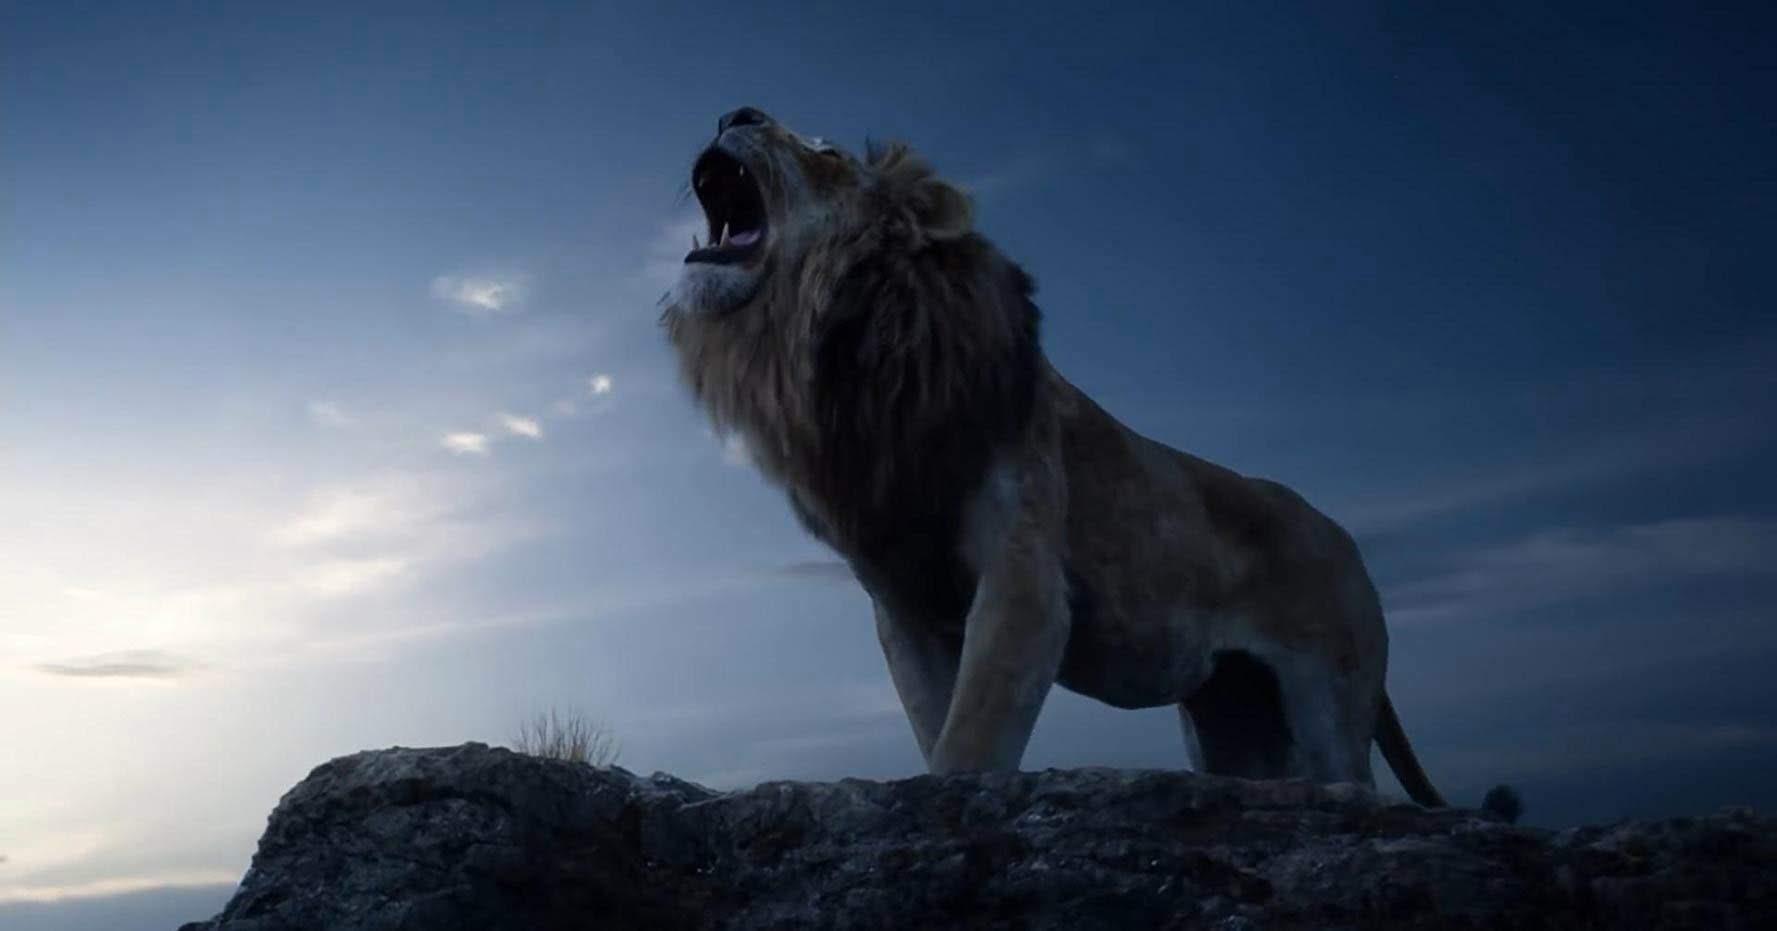 The Lion King Trailer - Original Animated Film vs Live Action Movie : ディズニー映画の最新作「ザ・ライオン・キング」は、オリジナルのアニメ映画をどう実写化したのか ? !、同じシーンのカットを並べてみた比較ビデオ ! !